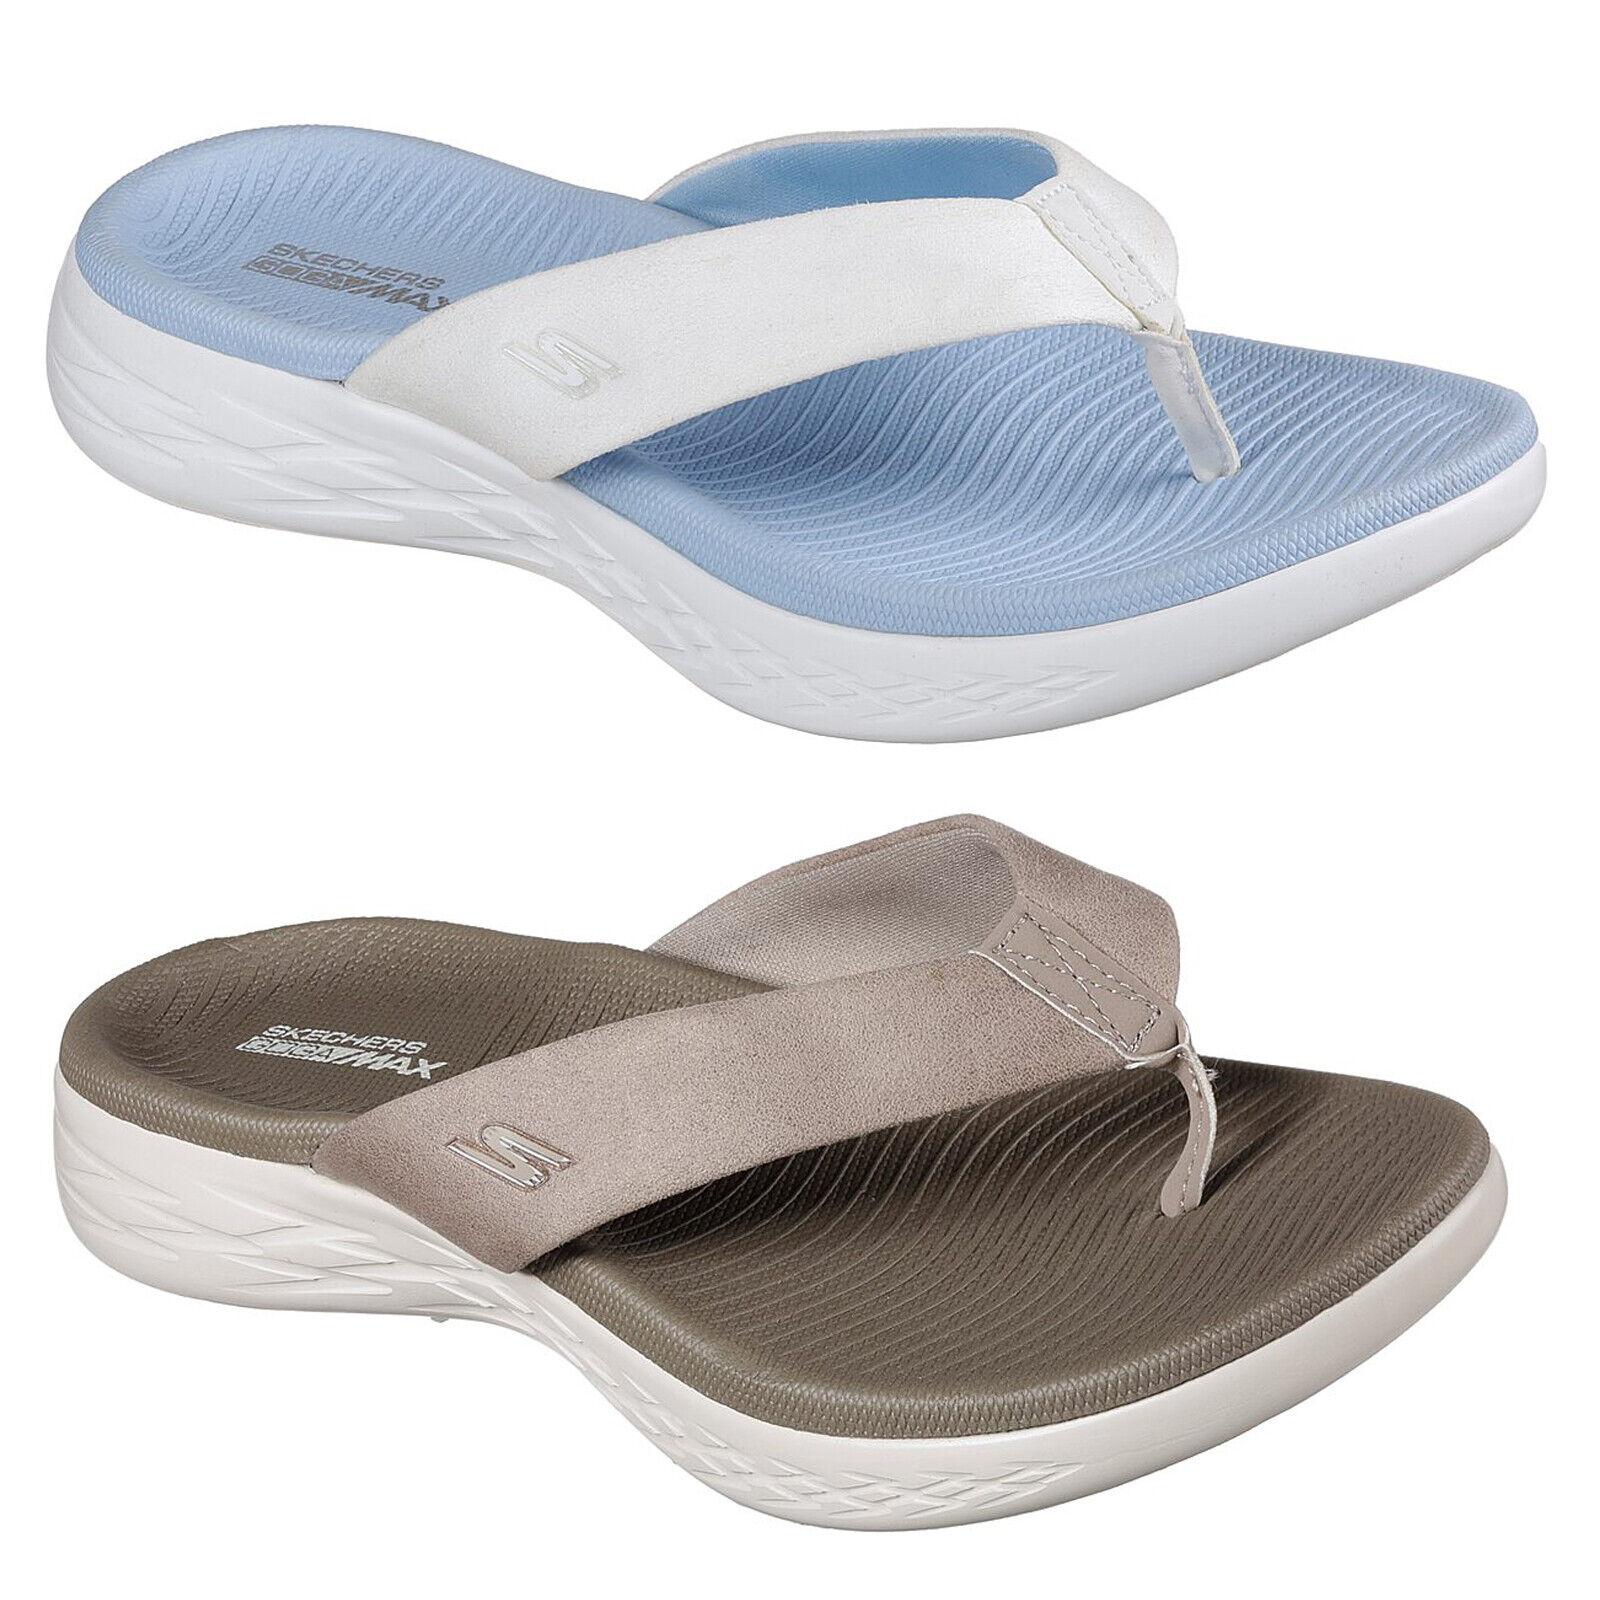 a3fdda9ed86b Details about Skechers On The Go 600 Polished Flip Flops Womens Summer Toe  Post Sandals 15303